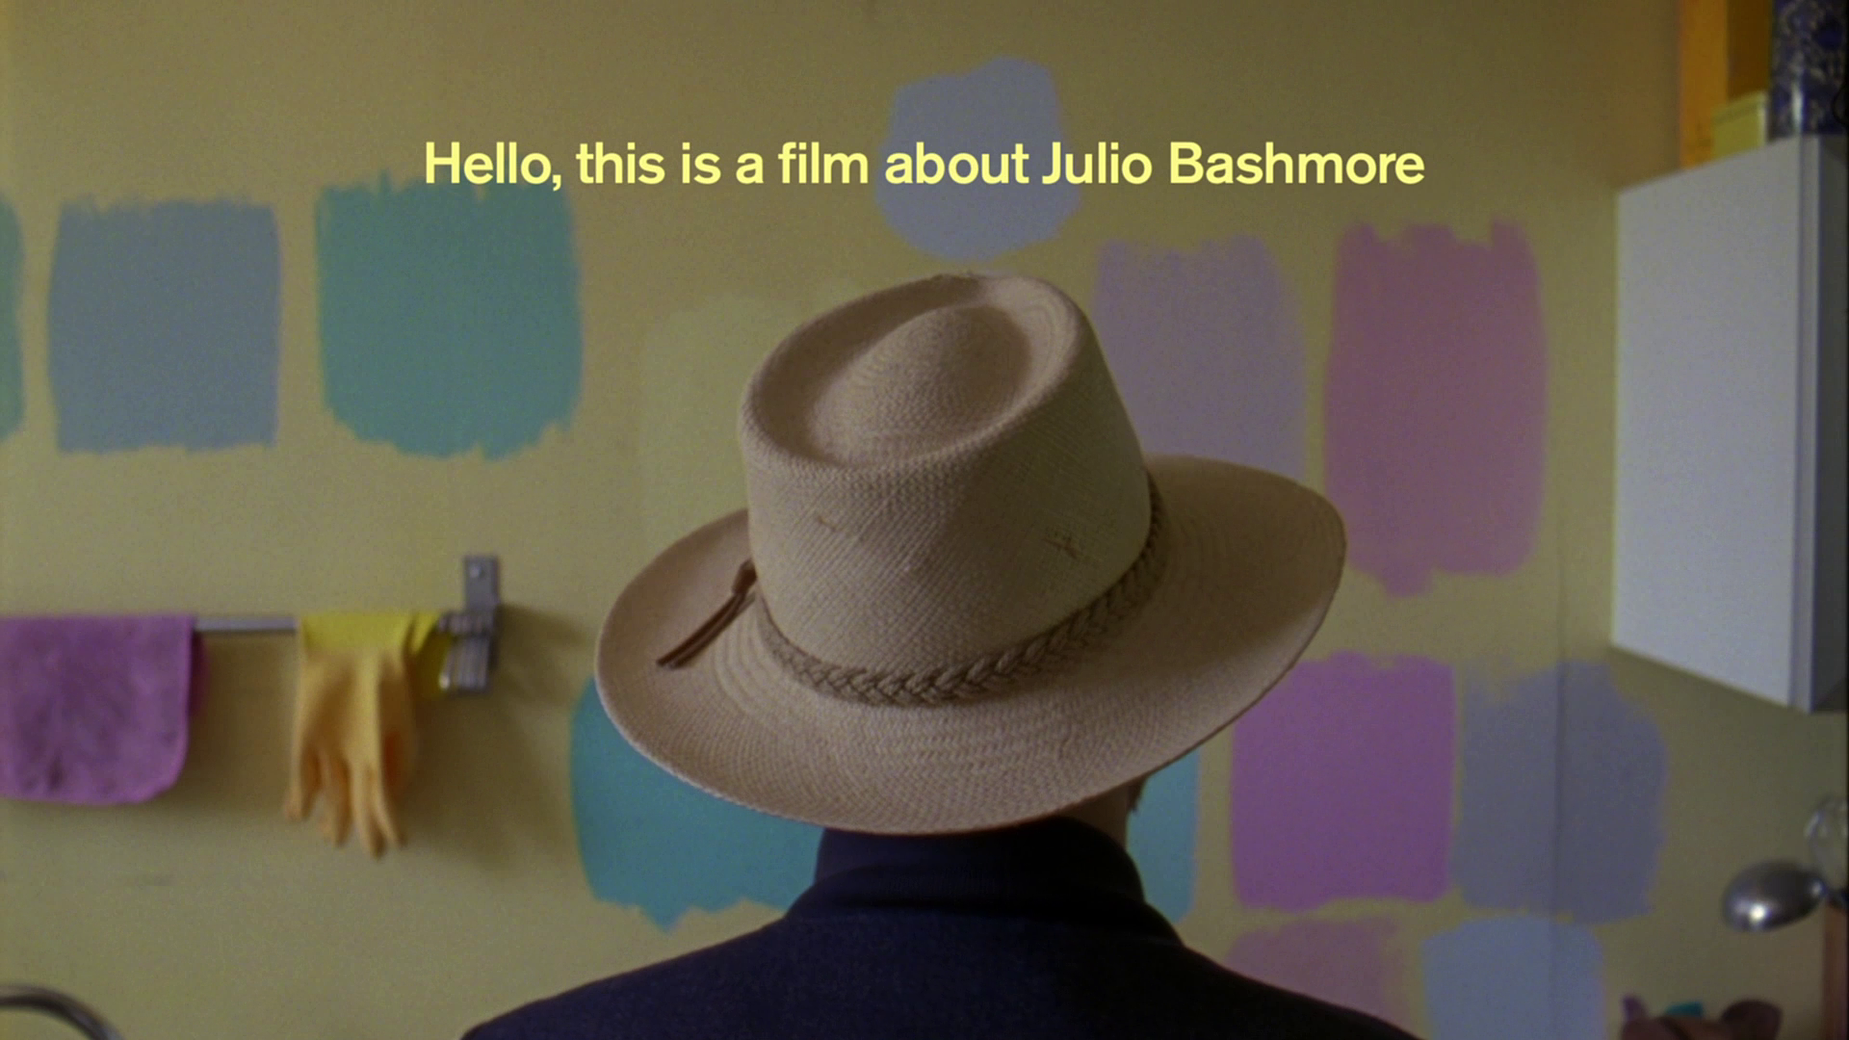 JULIO BASHMORE 'Knockin' Boots'